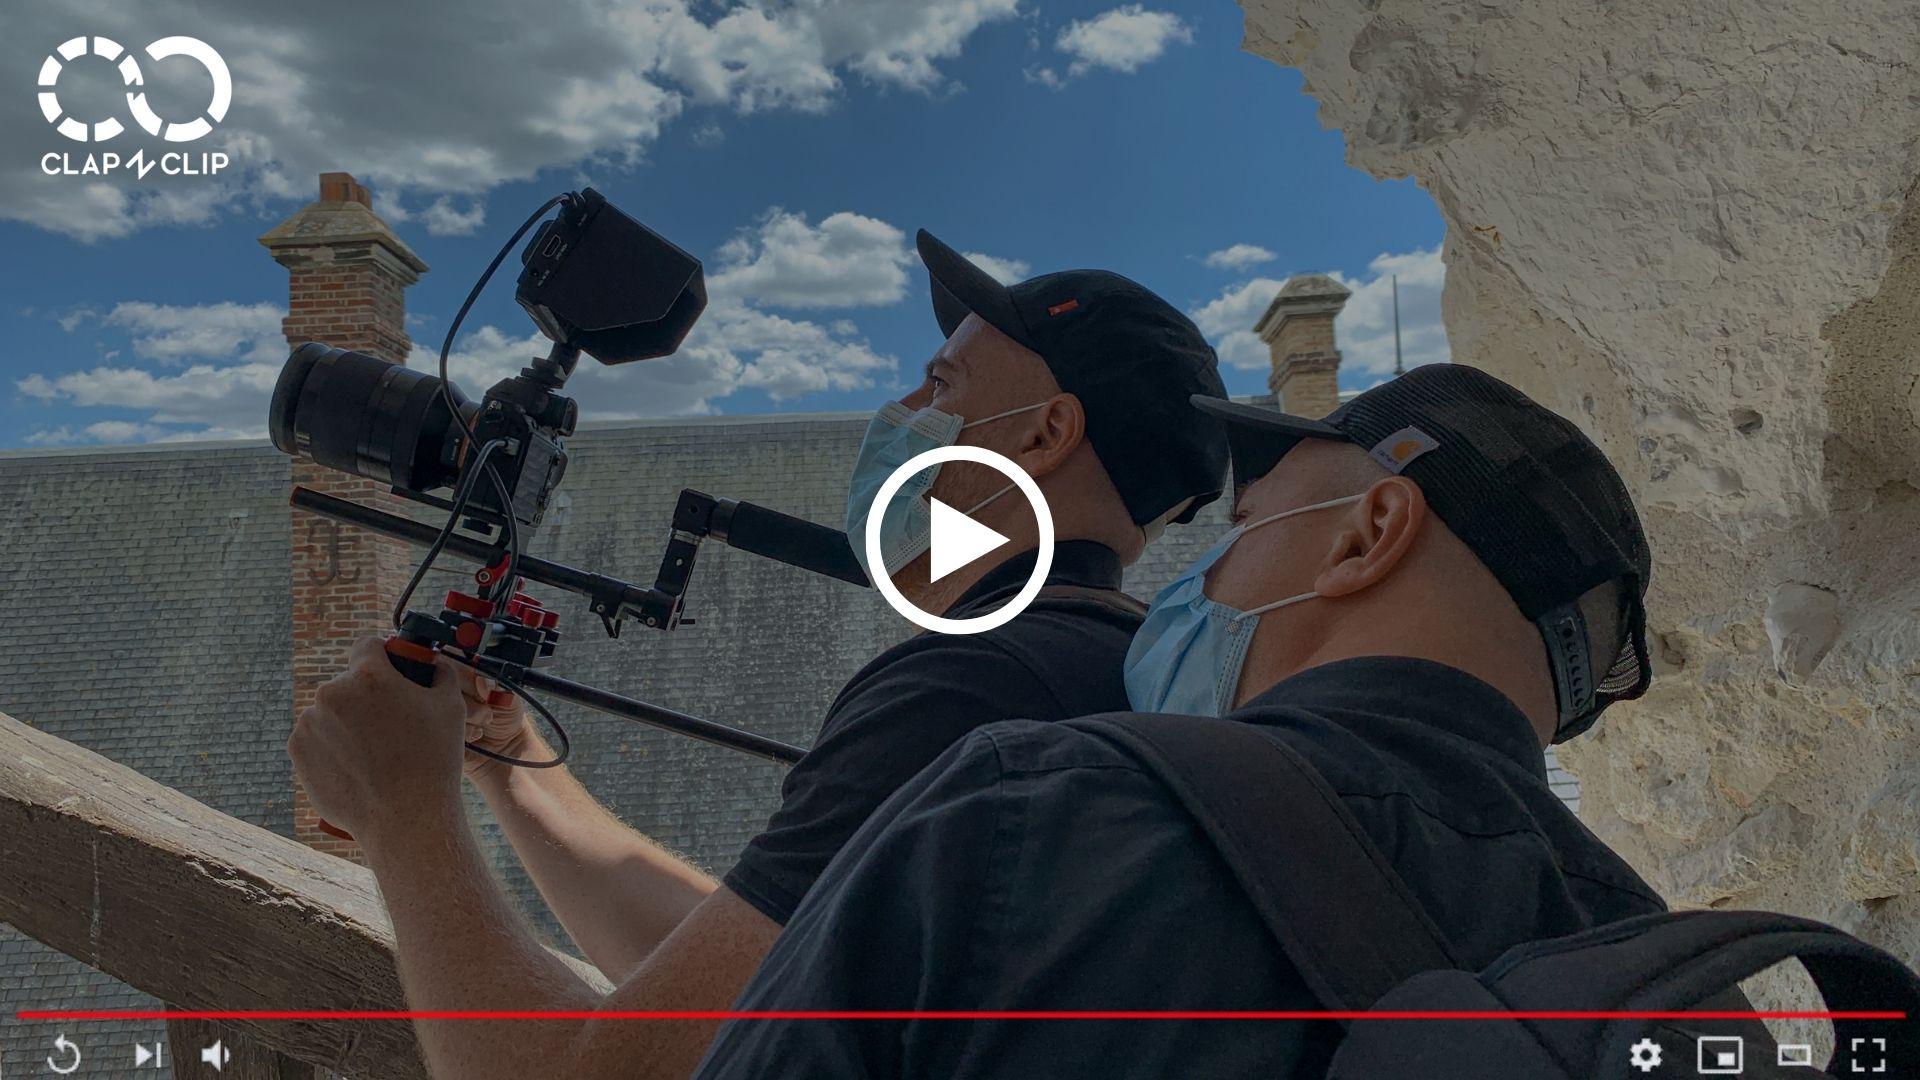 protocole covid tournage vidéo tourisme